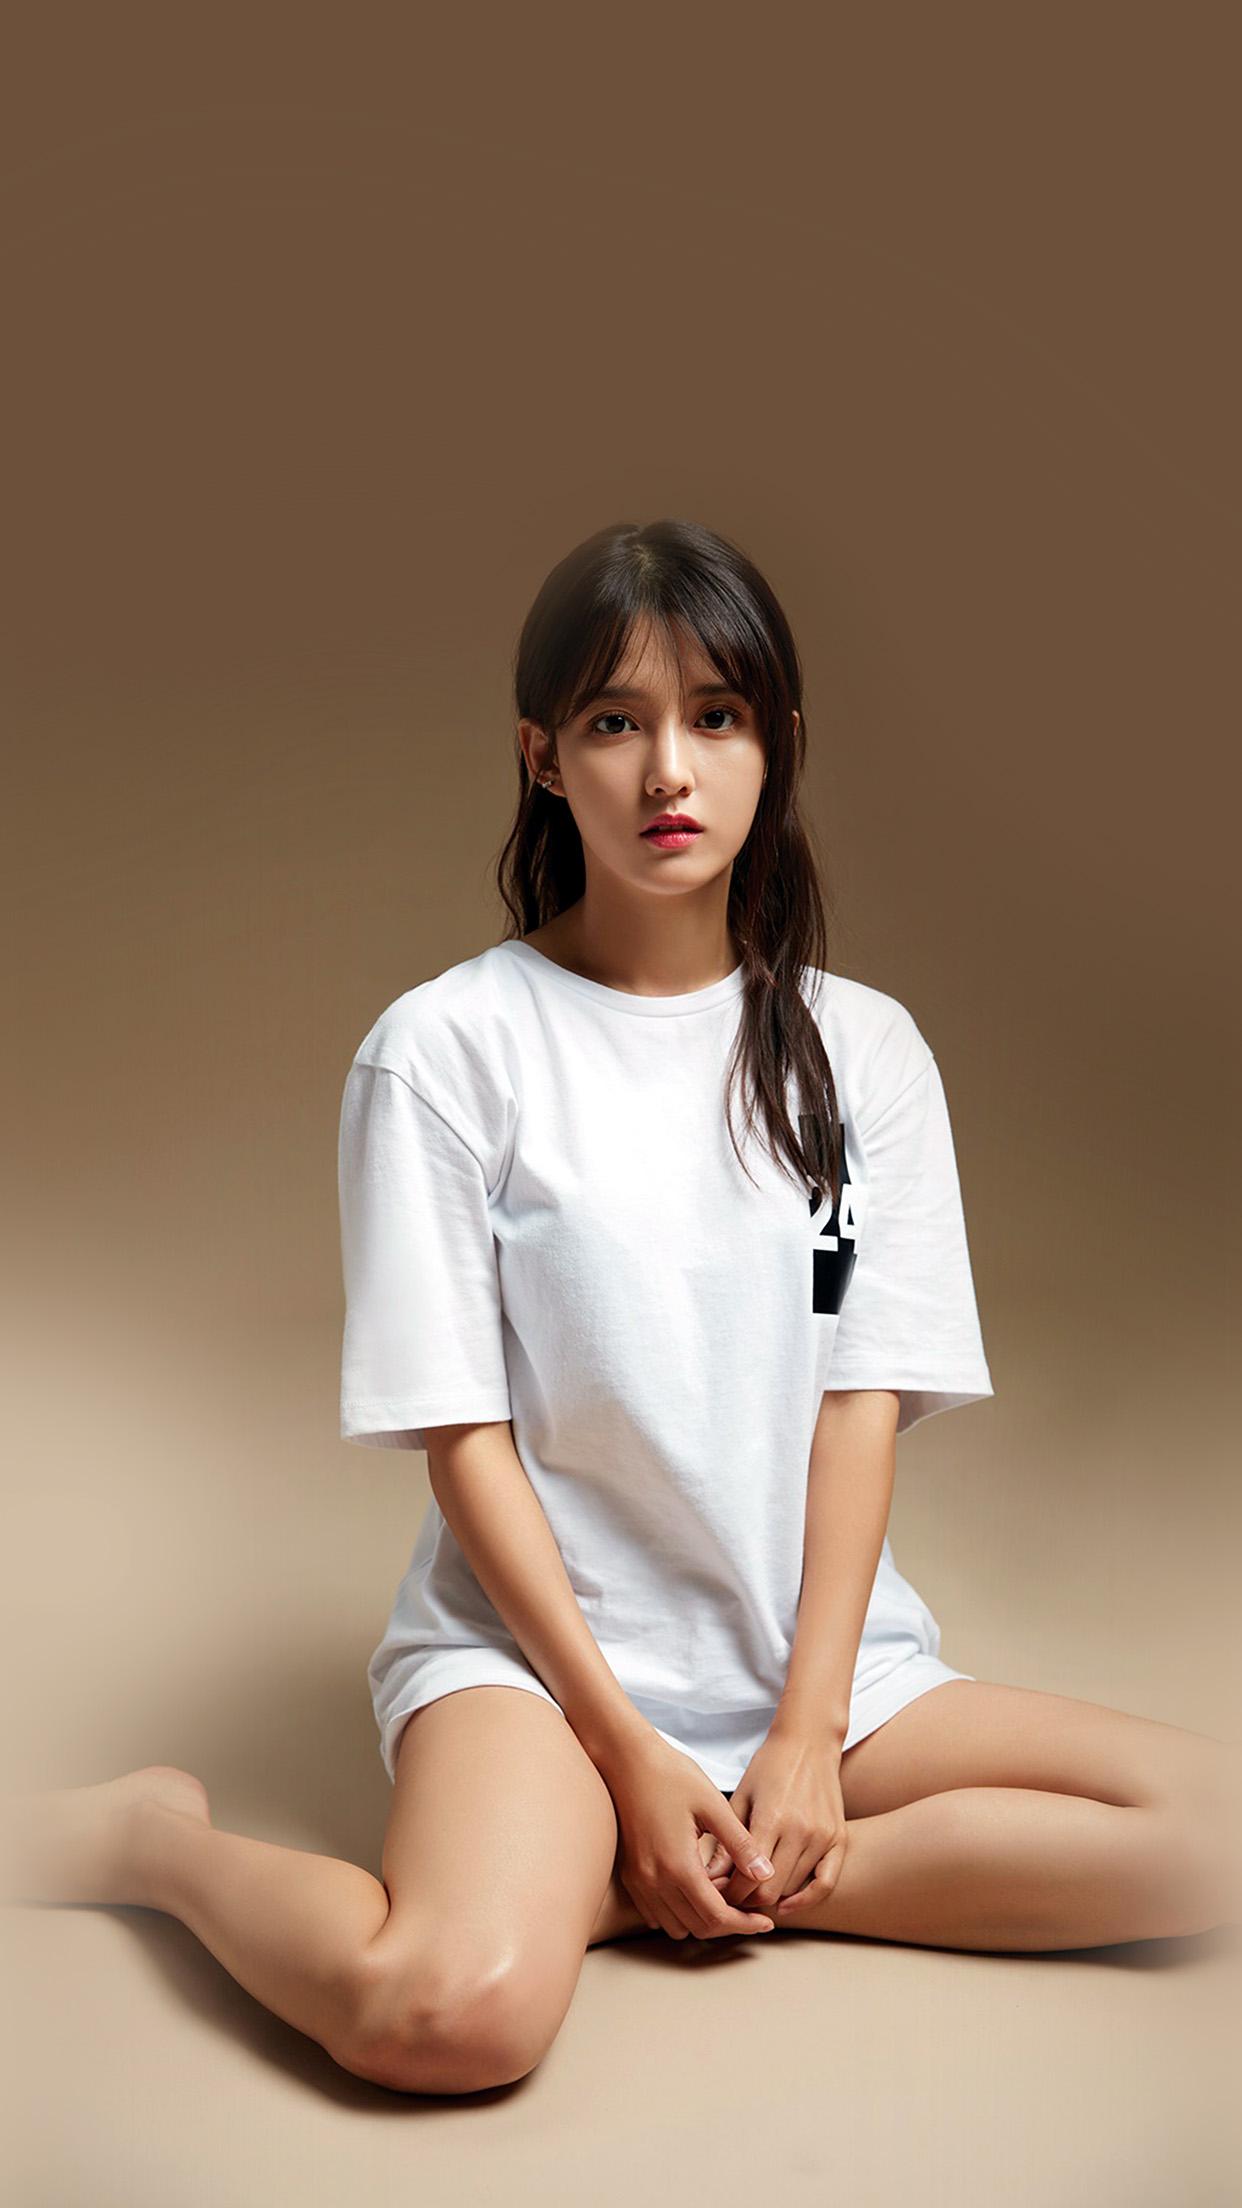 Dark Anime Girl Phone Wallpaper I Love Papers Hk16 Nam Bora Kpop Girl White Brown